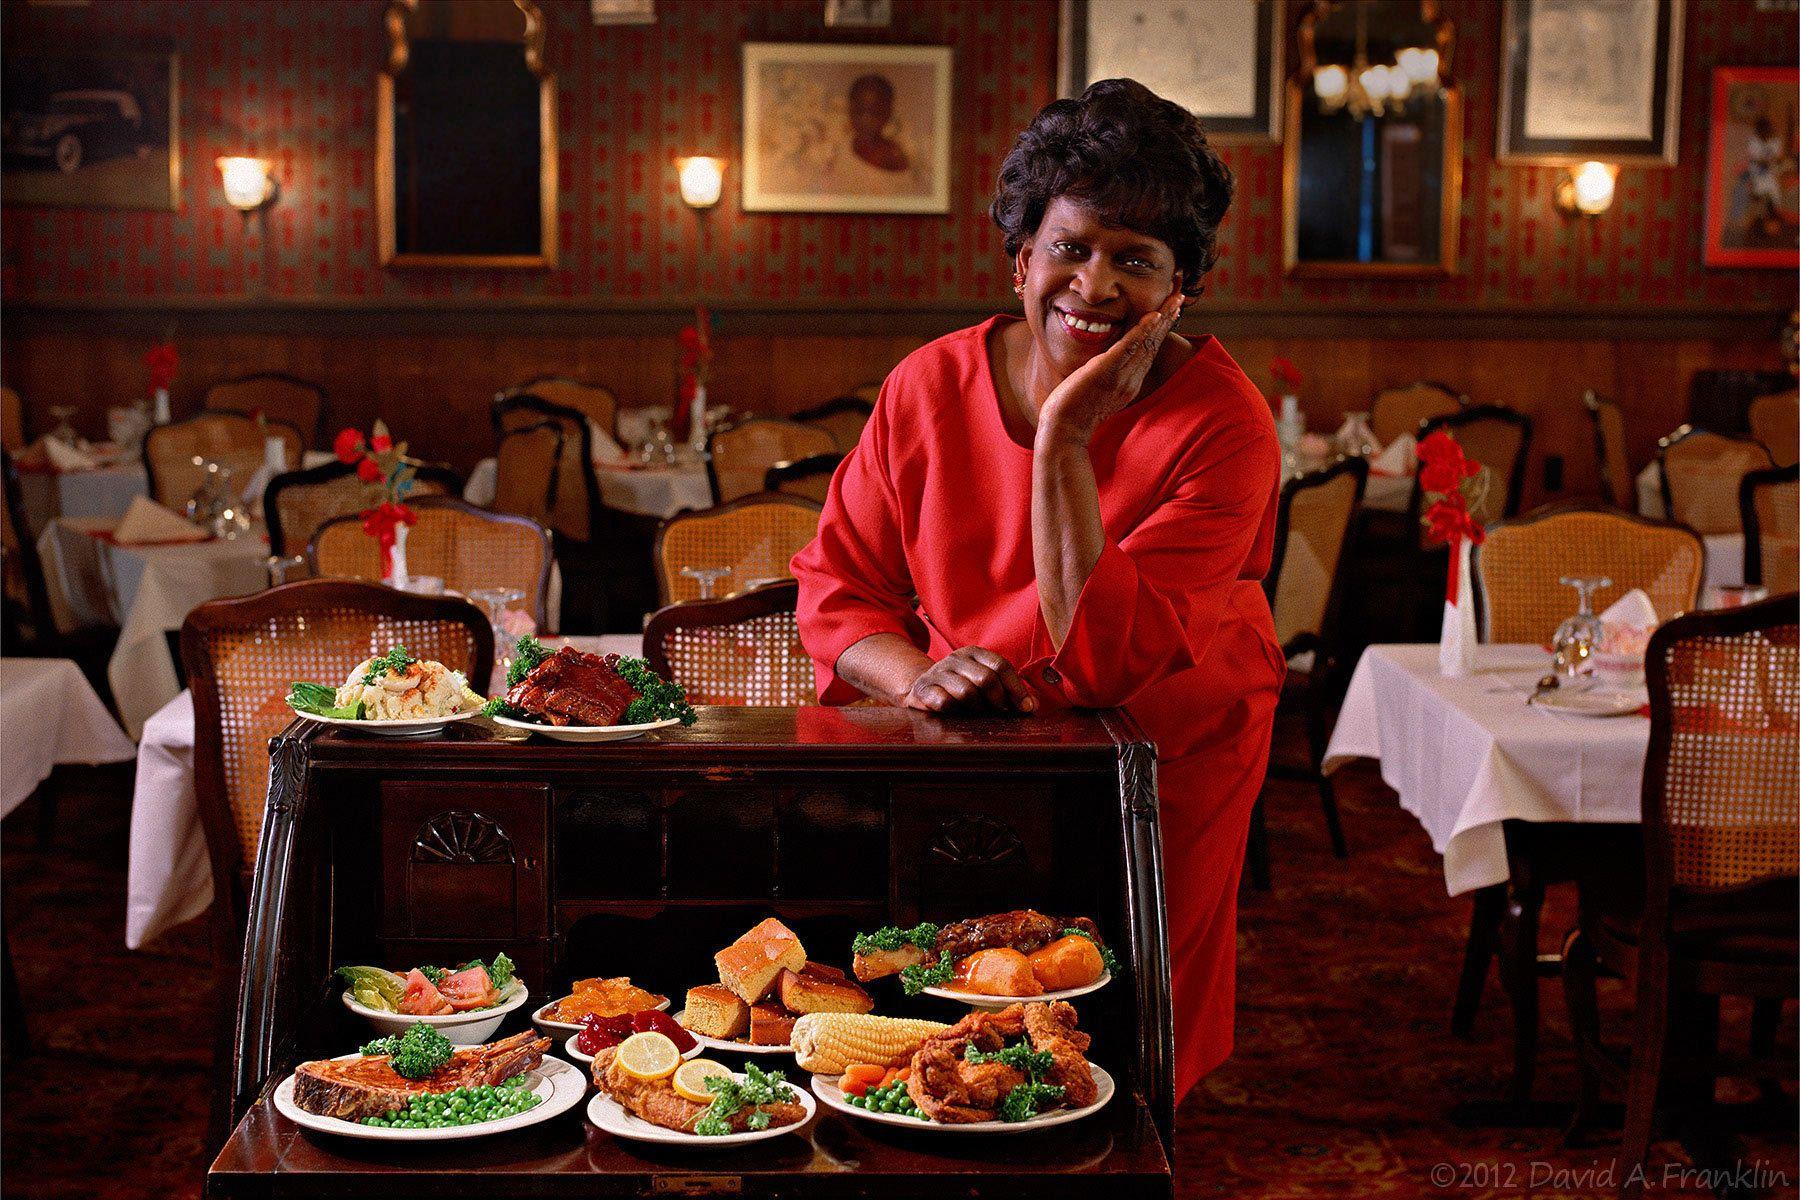 RestaurantOwner_FoodArrangedAtTable_DiningRoom_DetroitBarbeque&More_Editorial